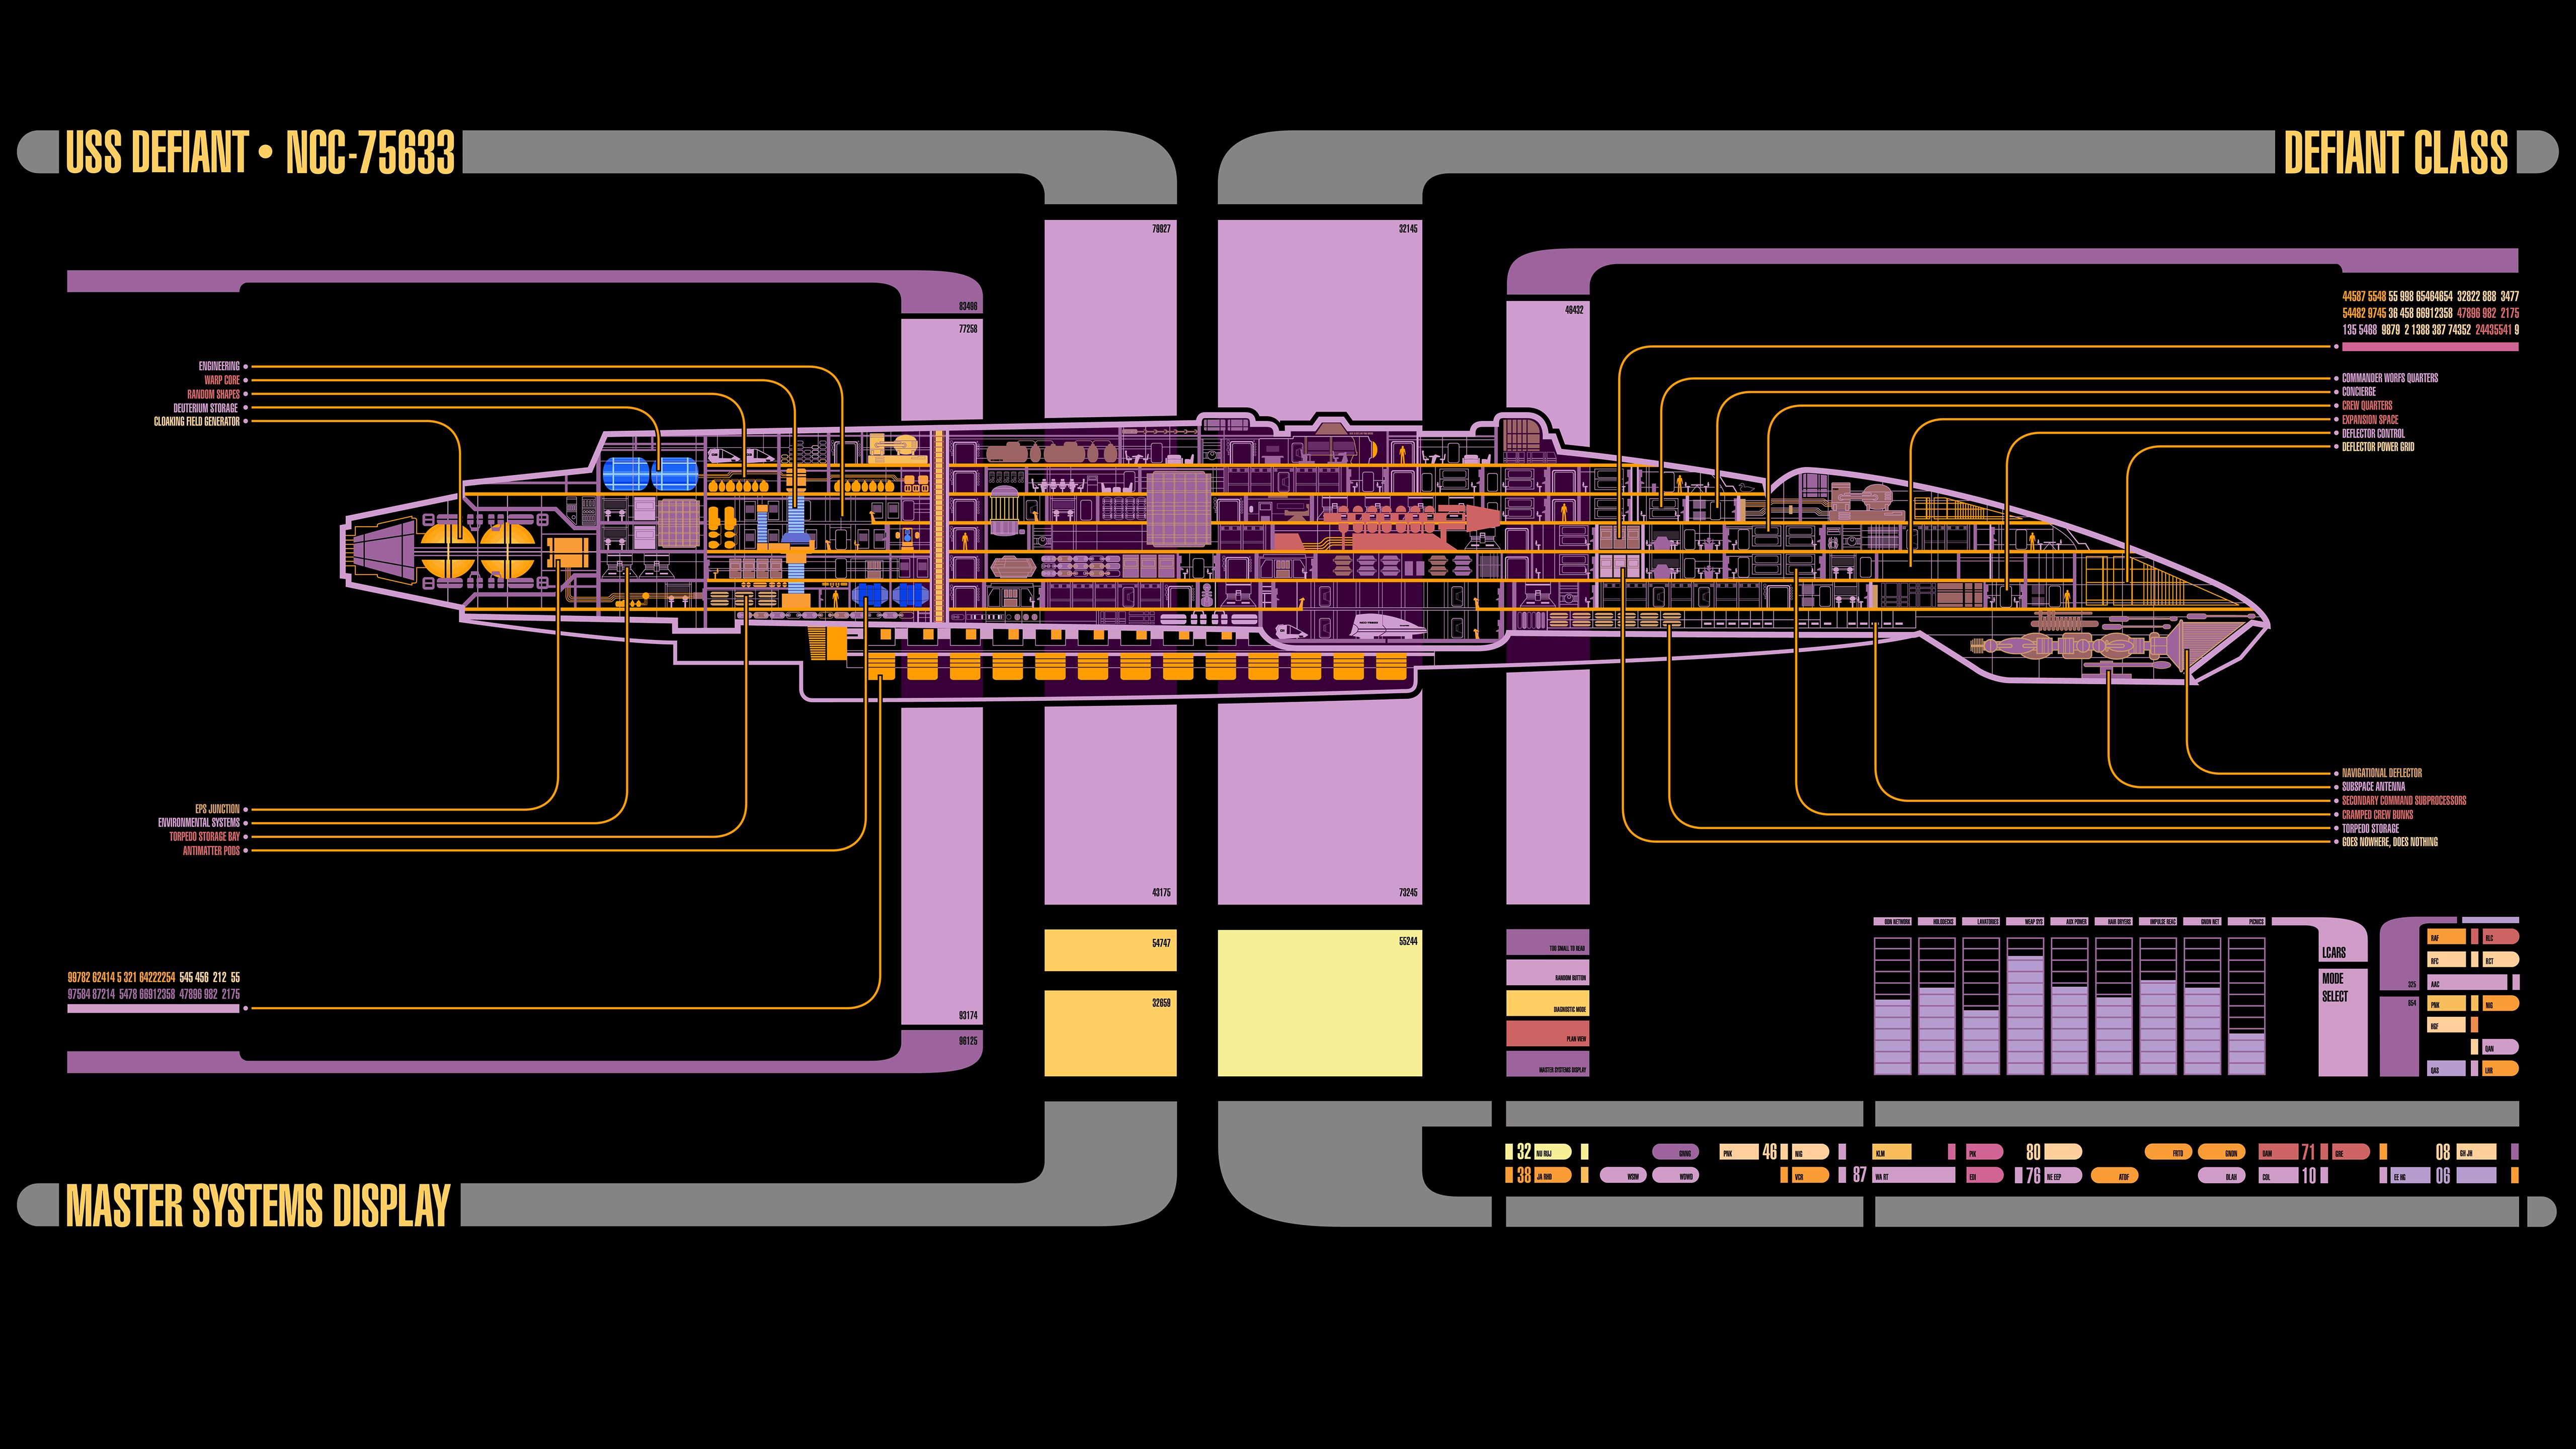 Star Trek USS Defiant LCARS